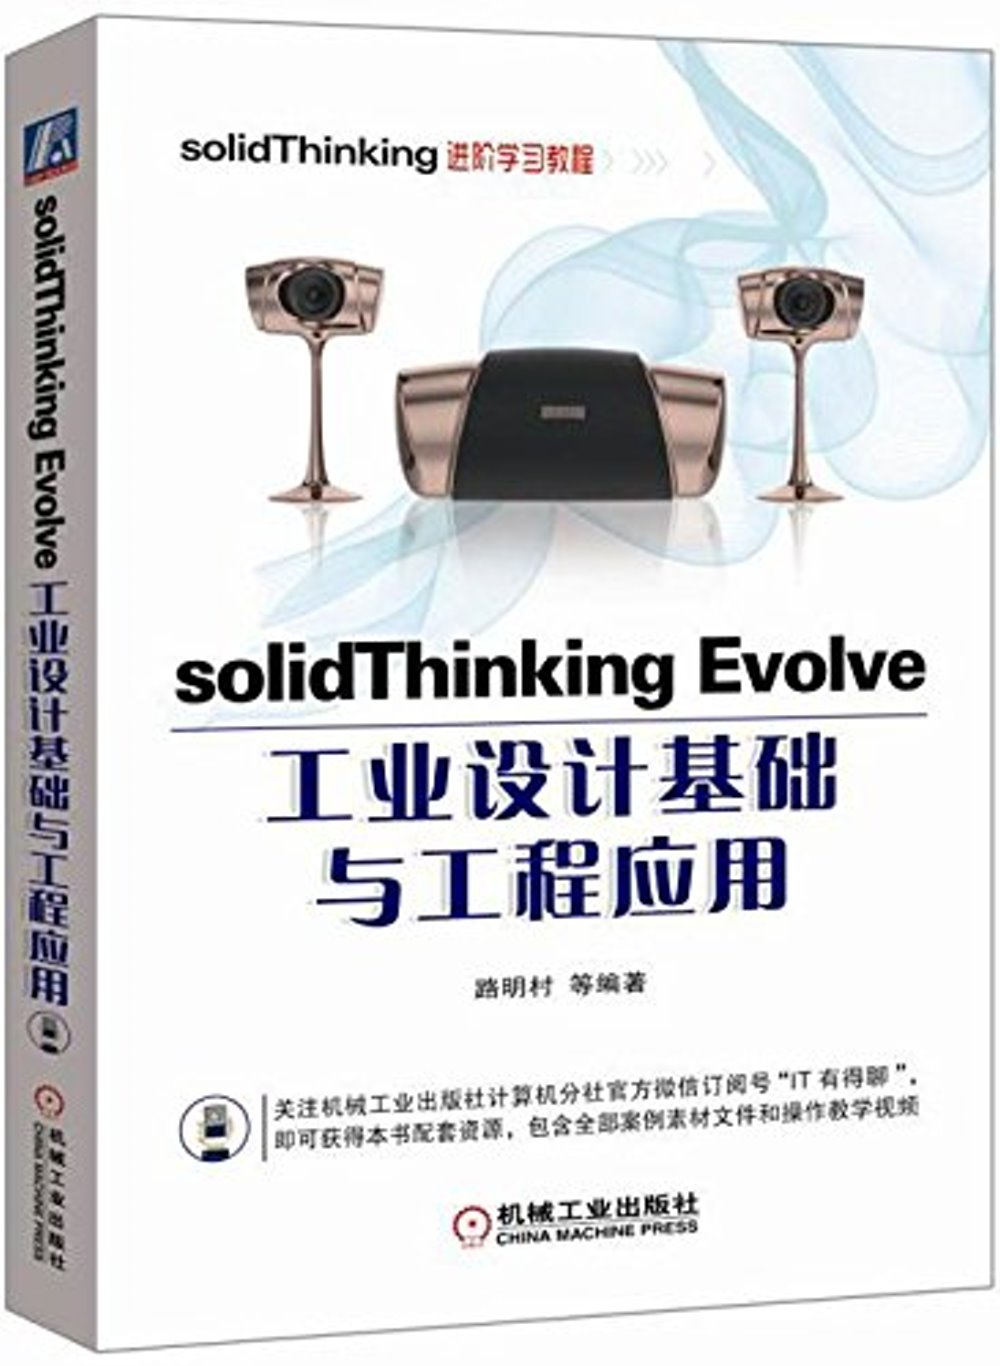 solidThinking Evolve工業 基礎與工程應用